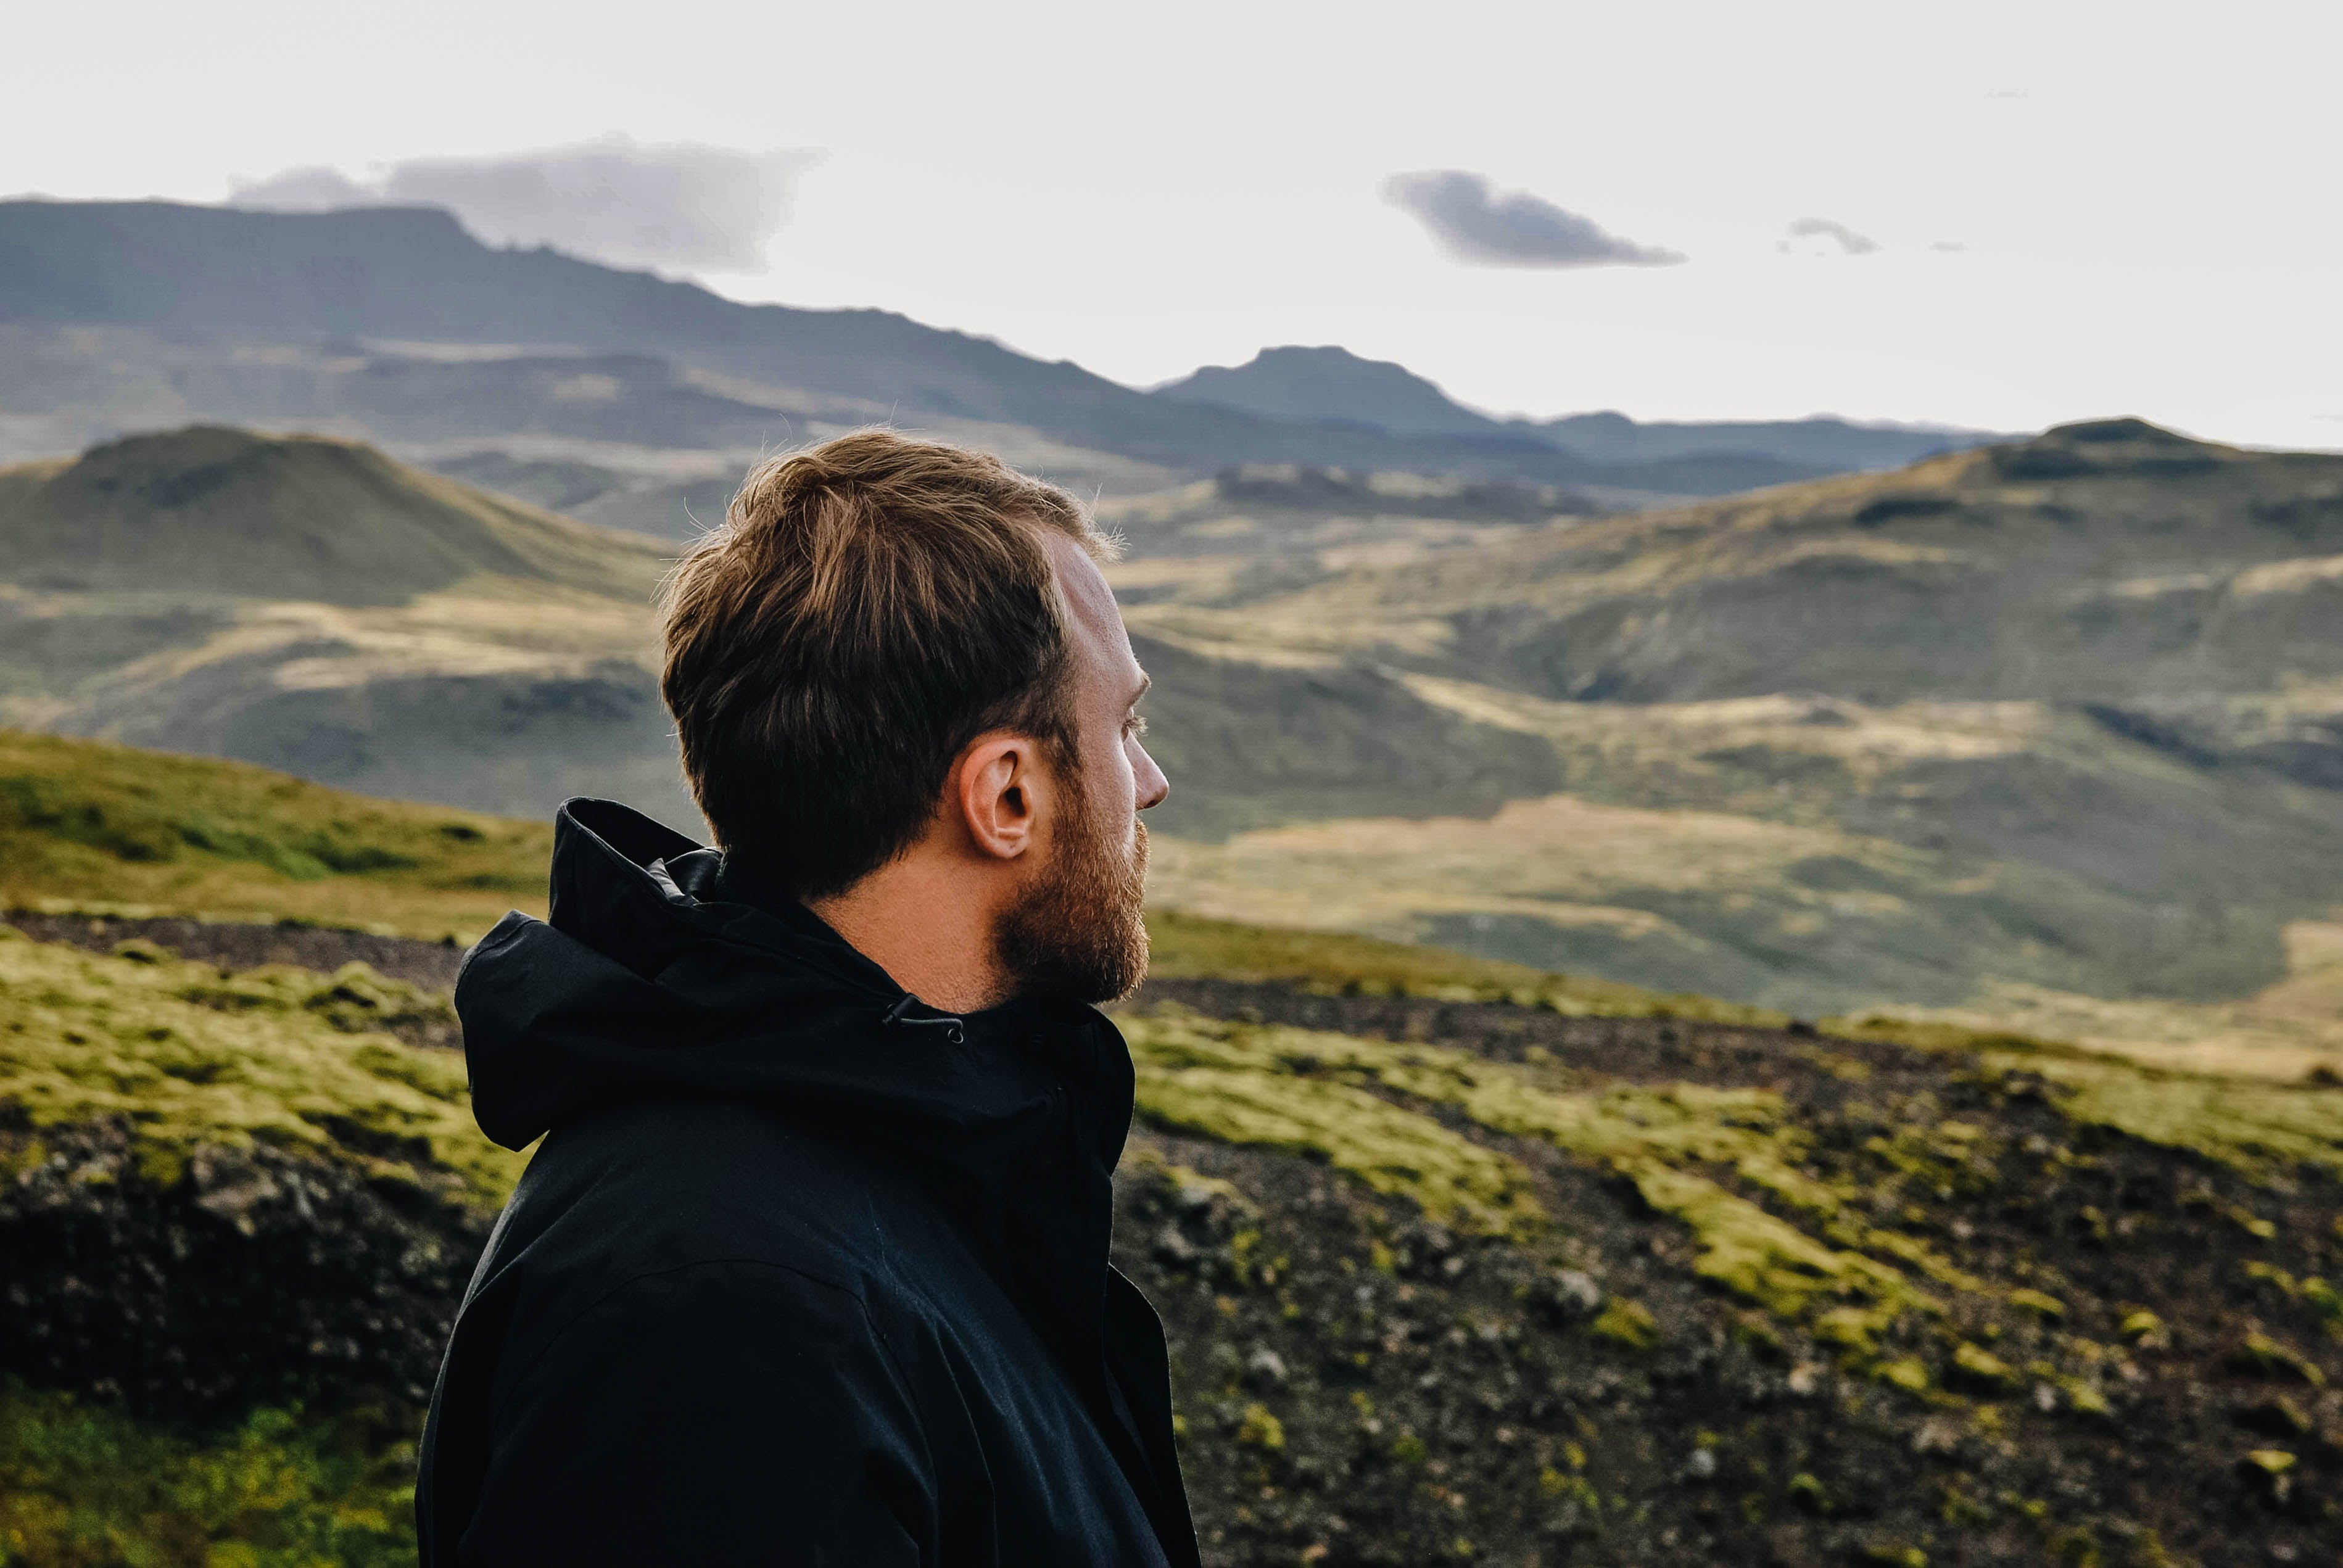 zu abenteuer, berg, besichtigung, feld